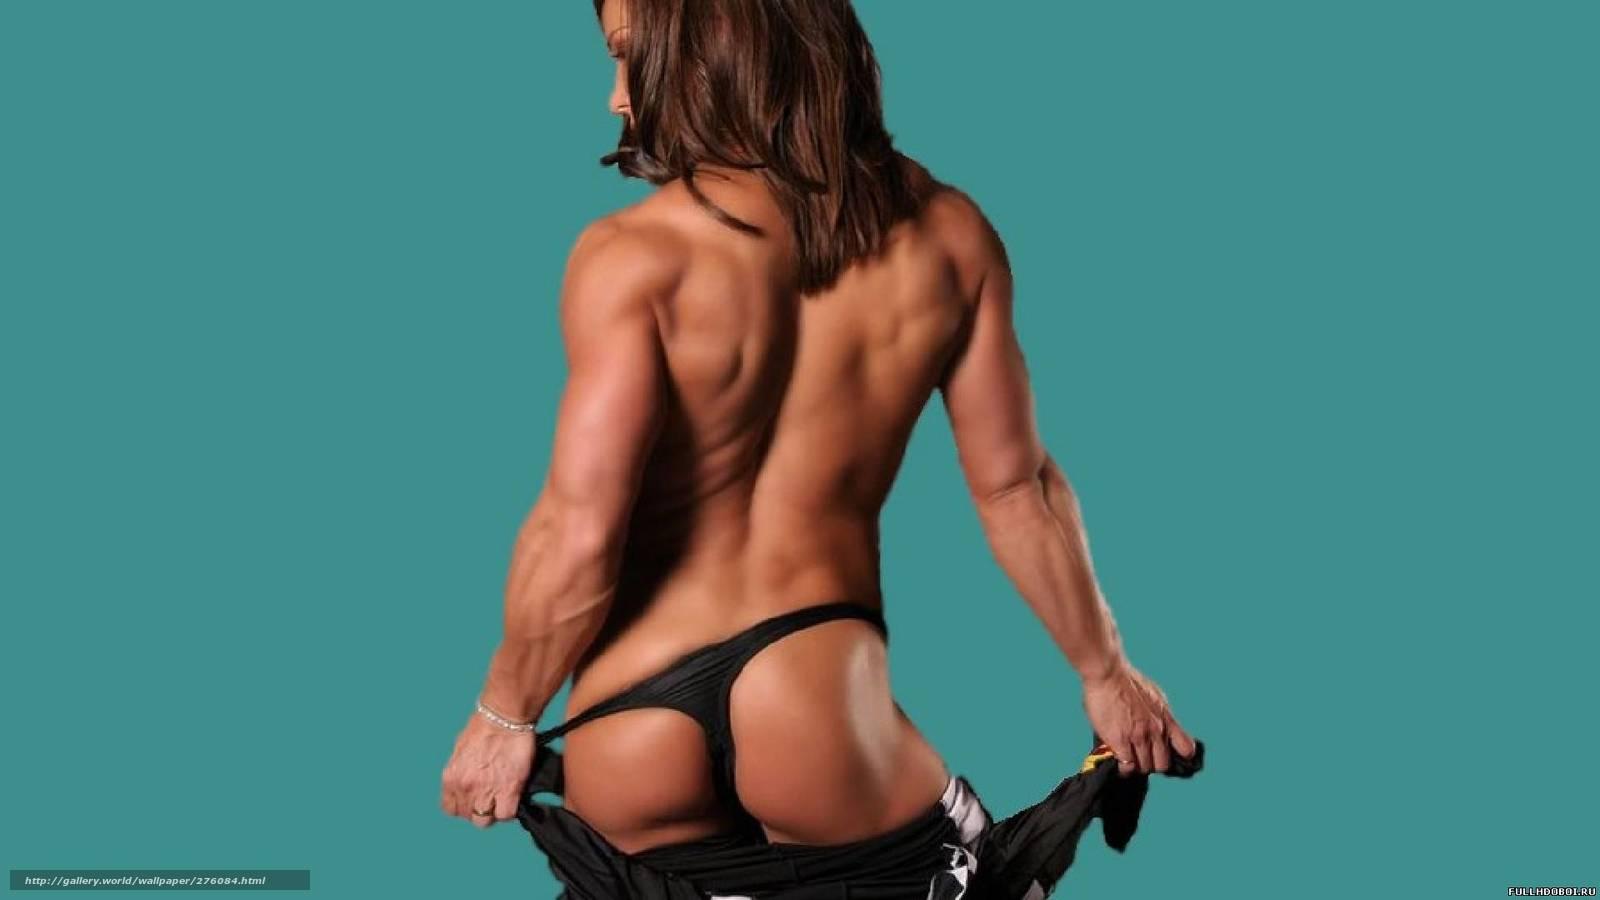 Фото бодибилдинг женщины эро 9 фотография